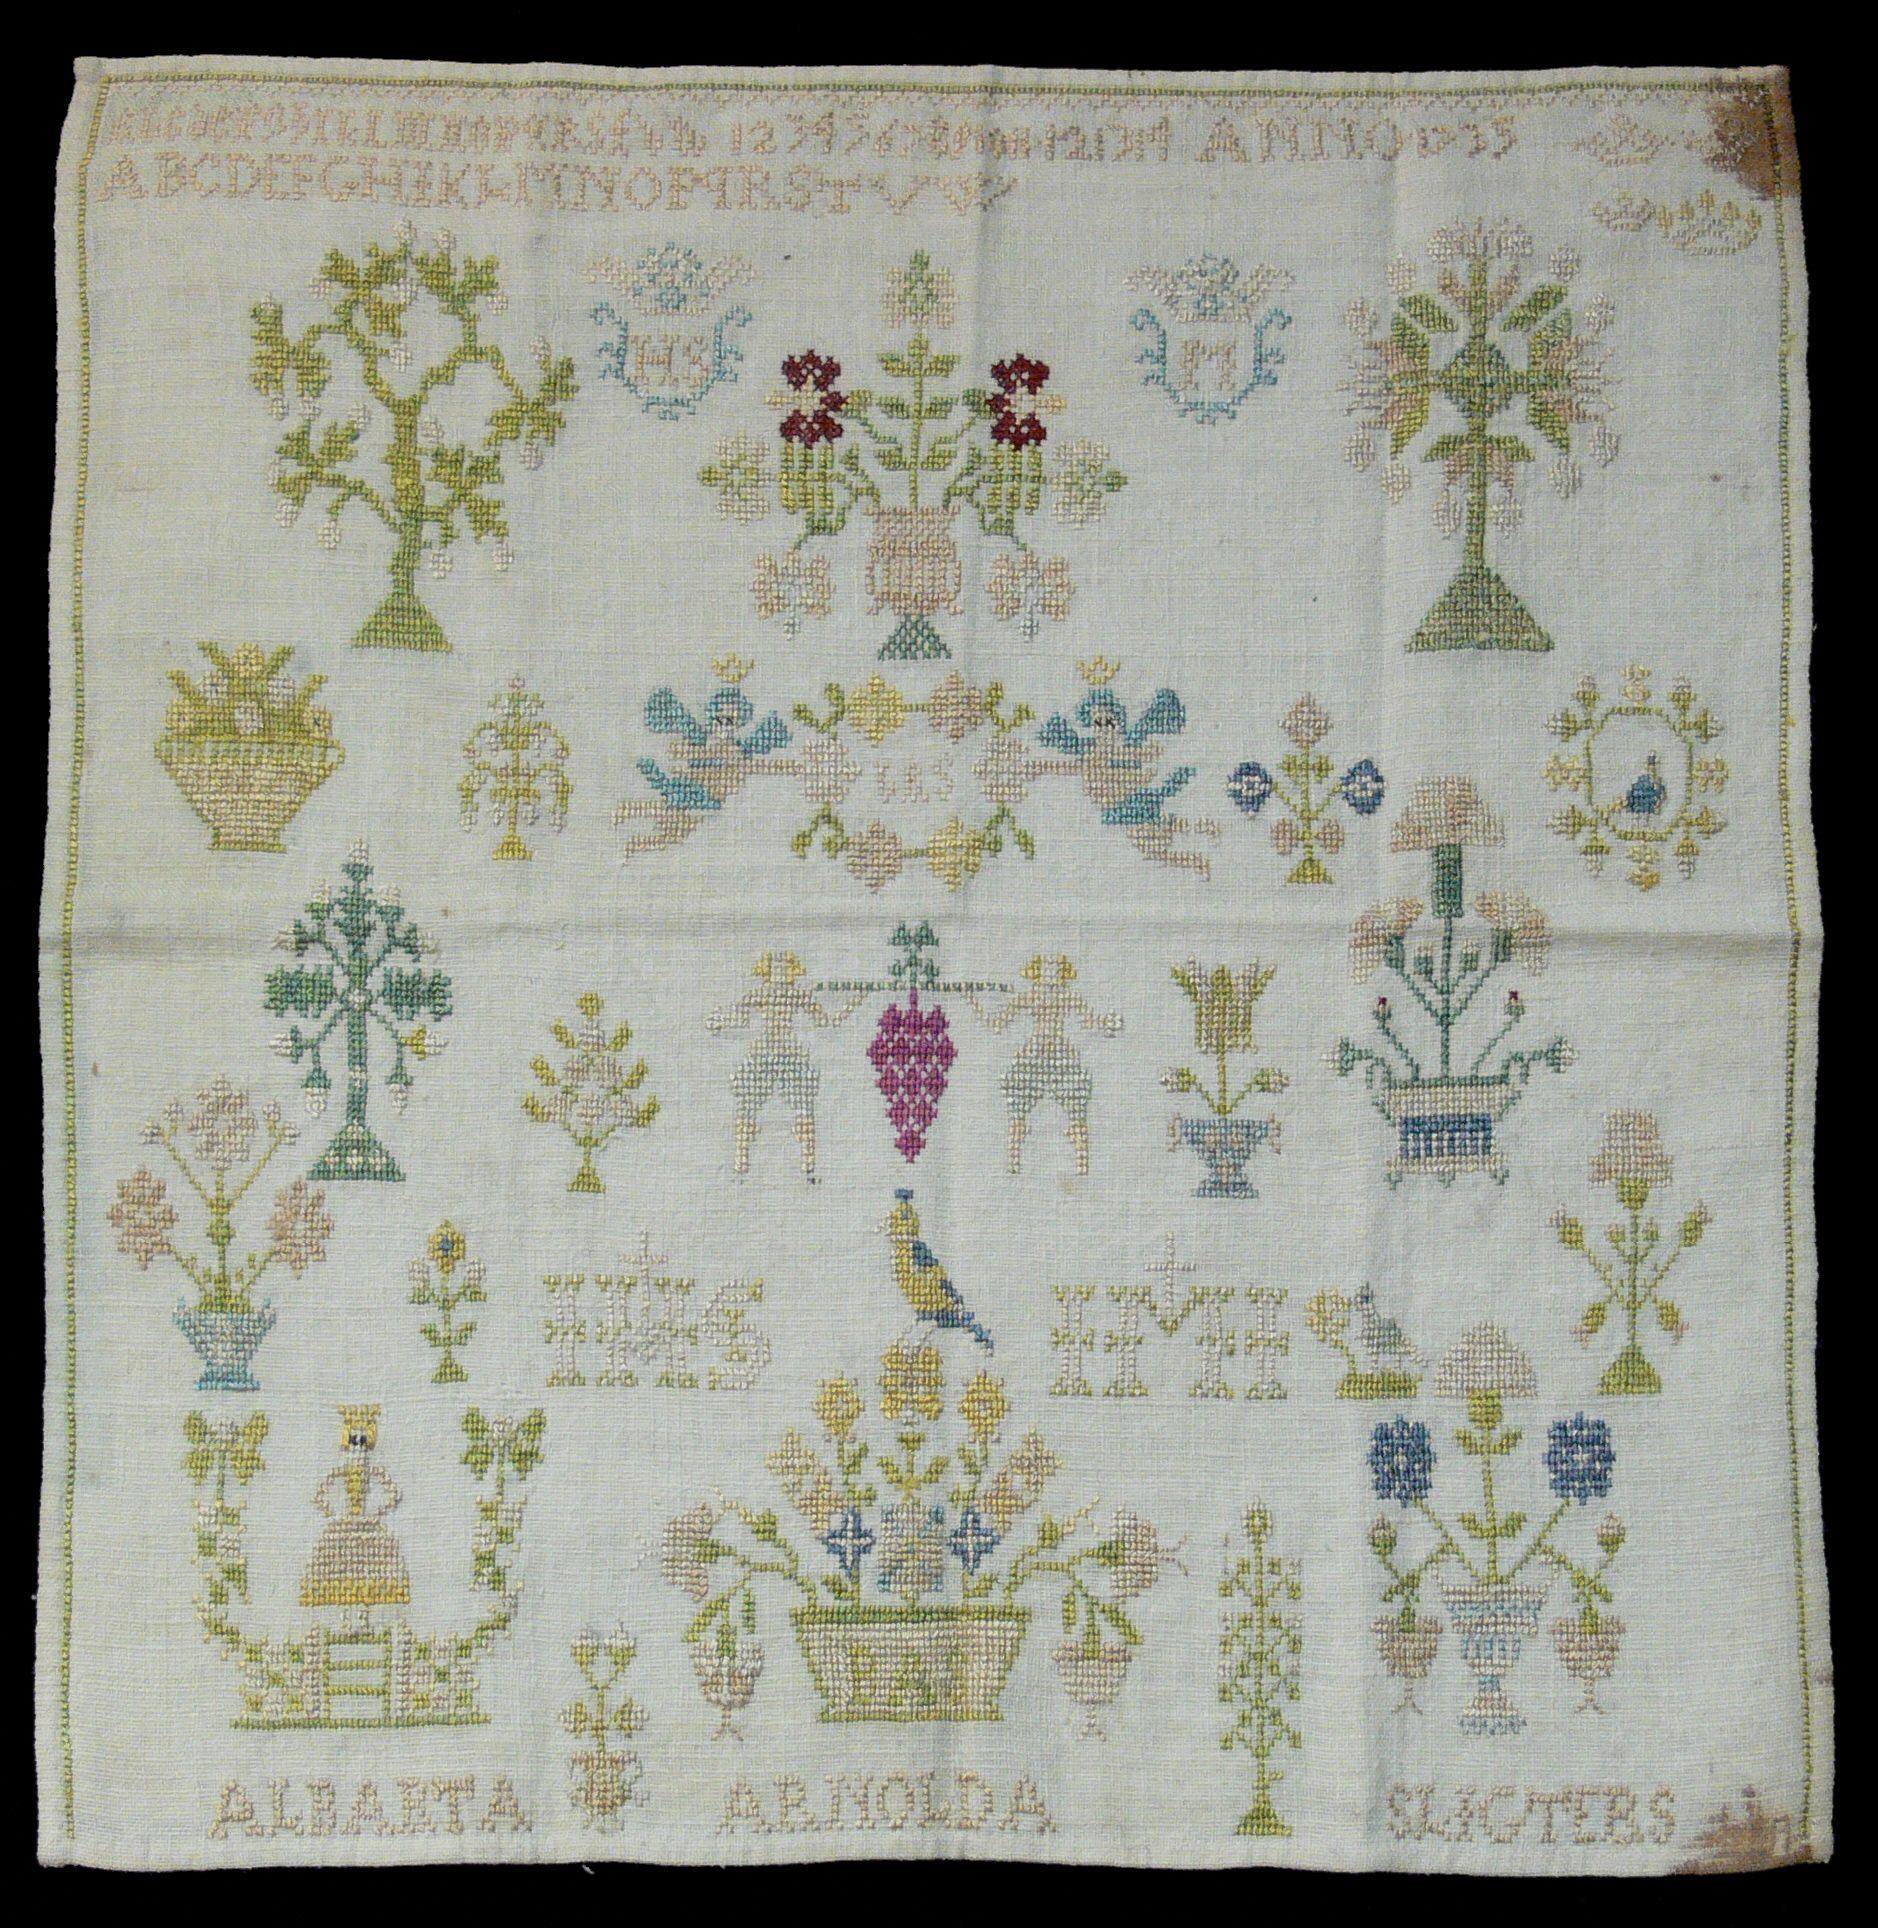 Cross stitch embroidery sampler of Alberta Arnolda Sligters, 1735.